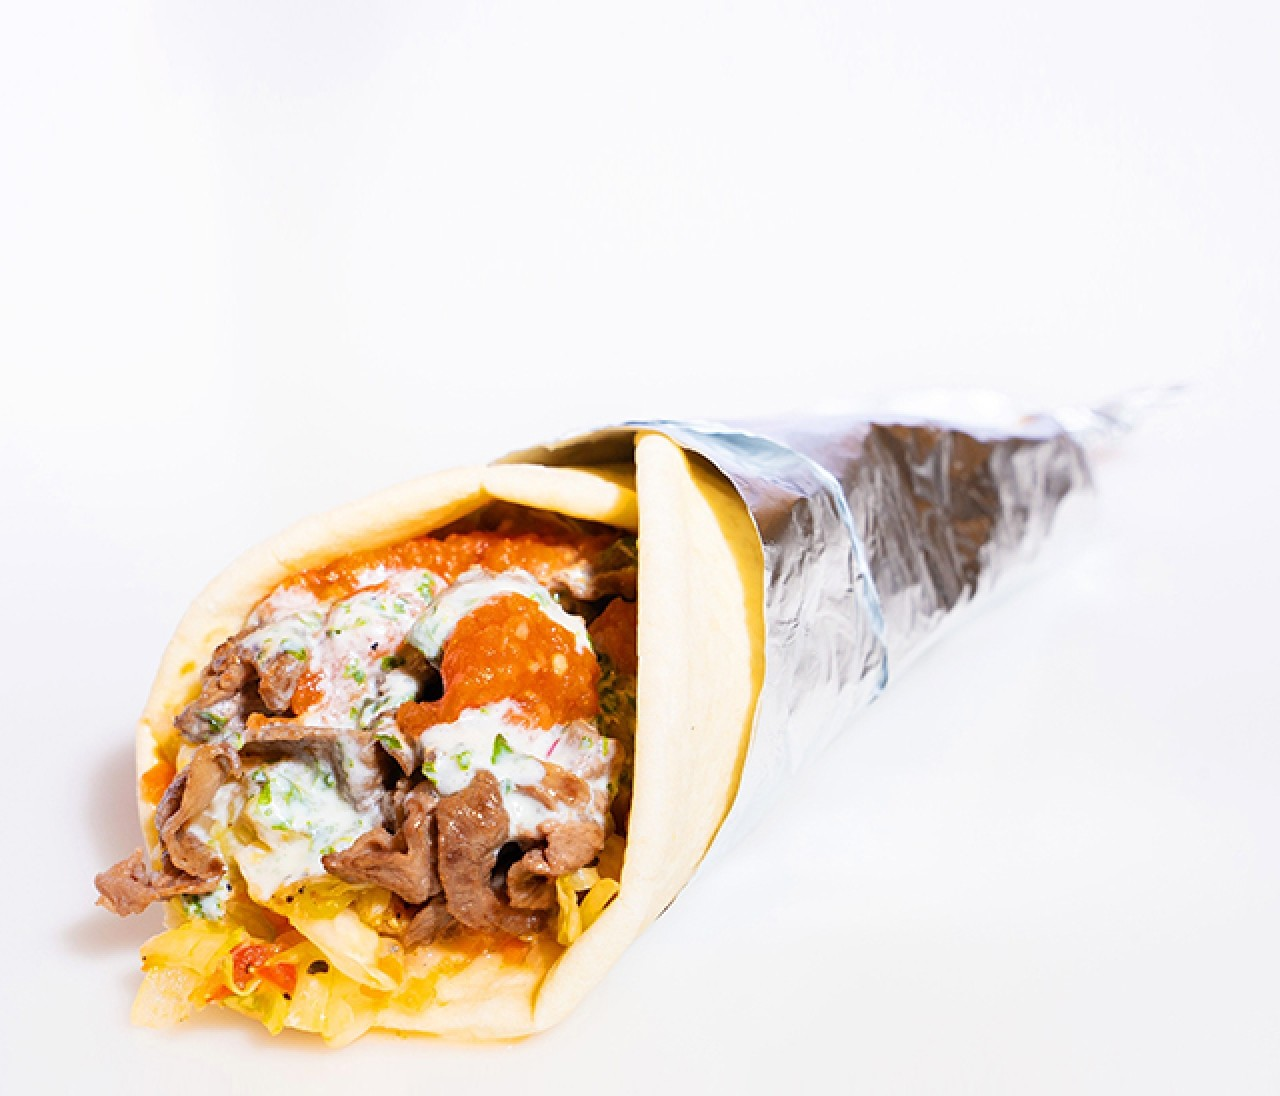 B級屋台フード&音楽好き必見コラボ【Snack Time! feat. [ALEXANDROS]】